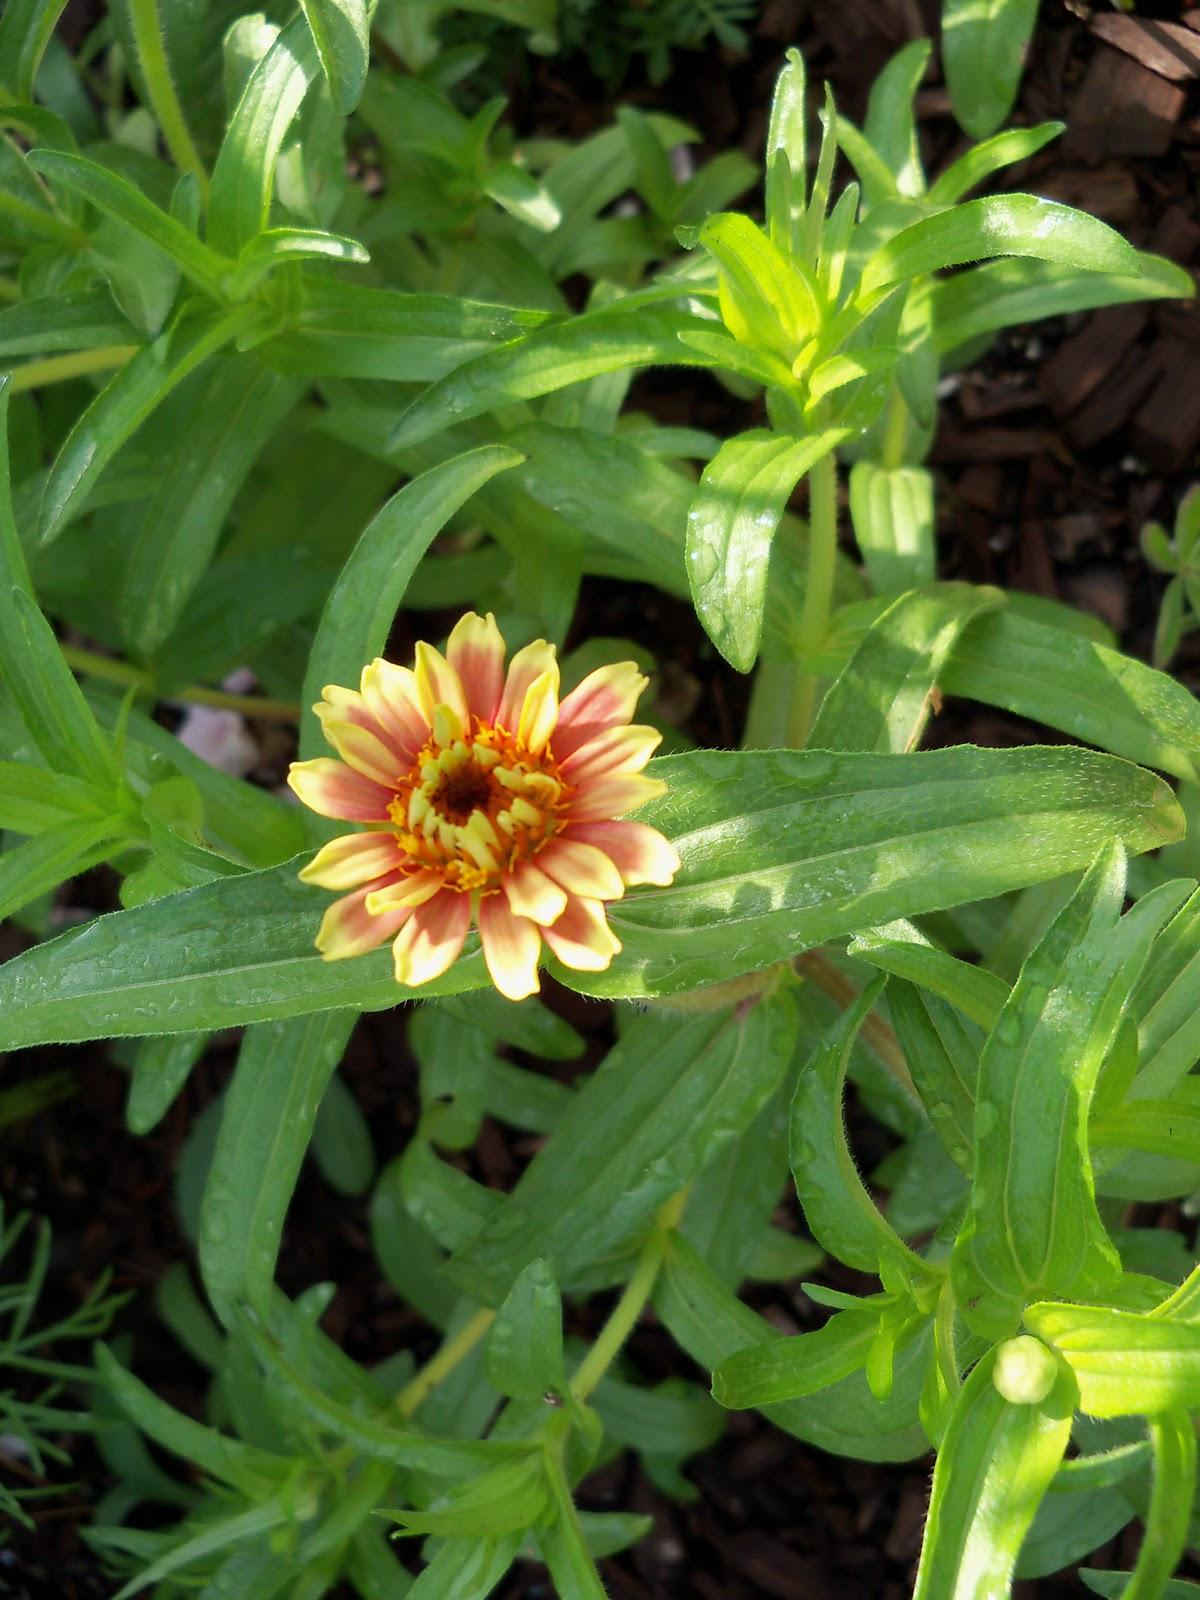 Gardening 2010, Part Two - 101_2378.JPG